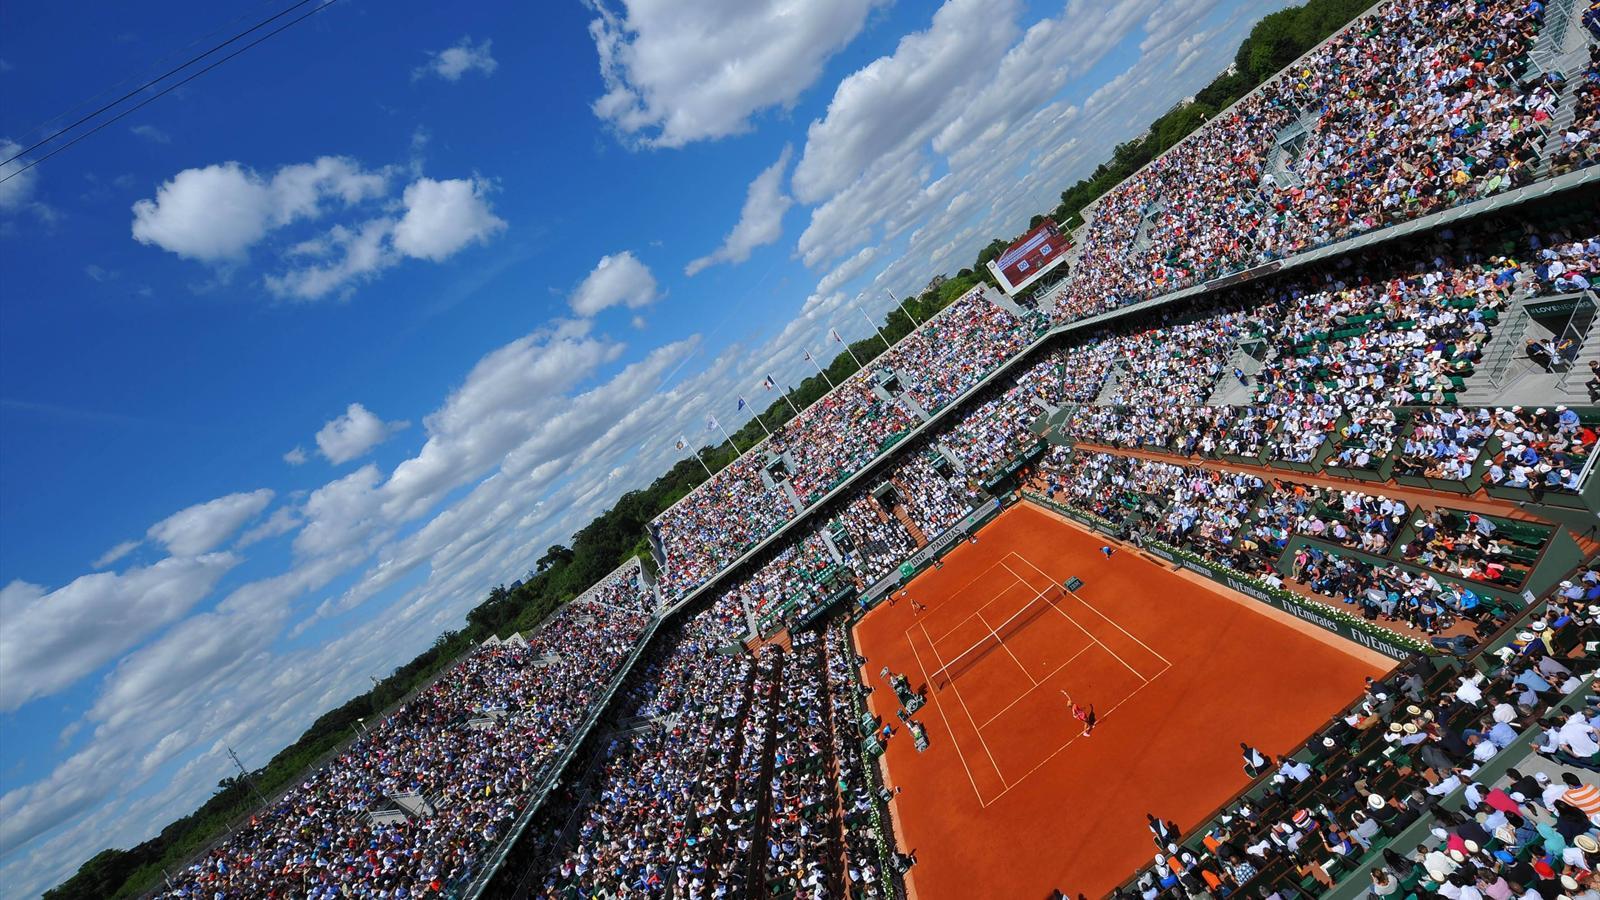 Roland-Garros sur Eurosport jusqu'en 2020 - Roland-Garros ...